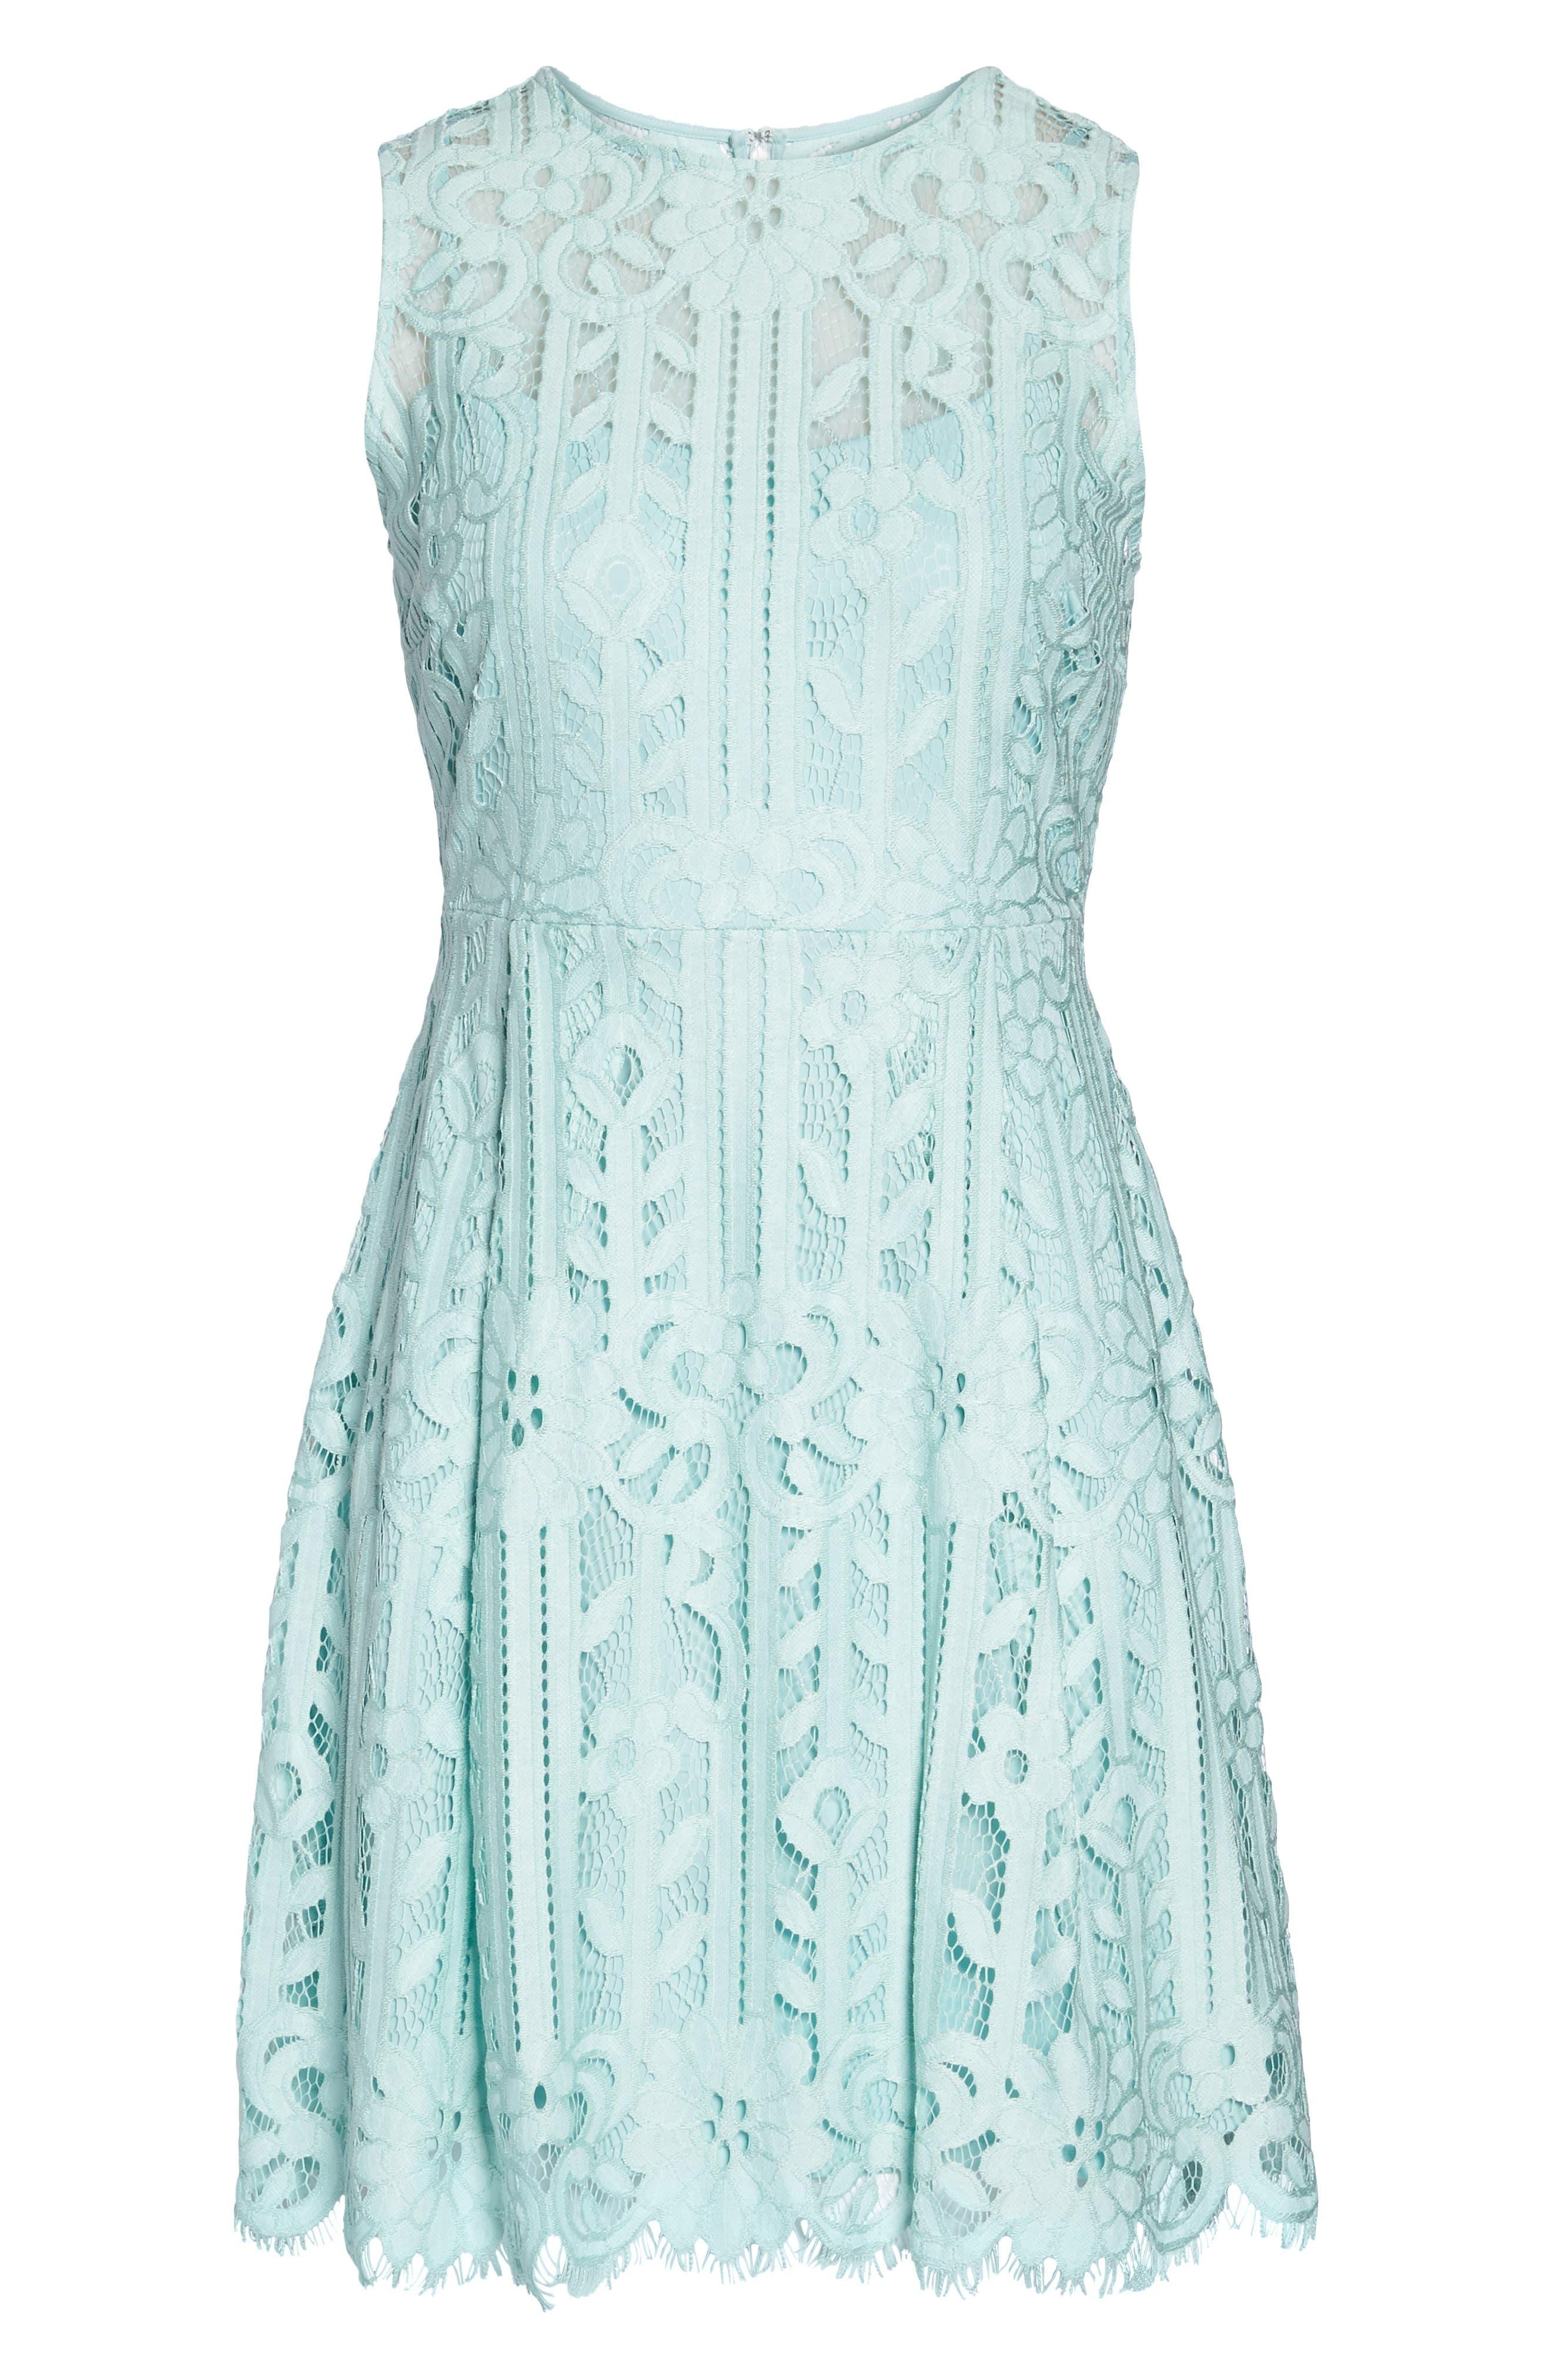 Sleeveless Lace Dress,                             Alternate thumbnail 7, color,                             Mint